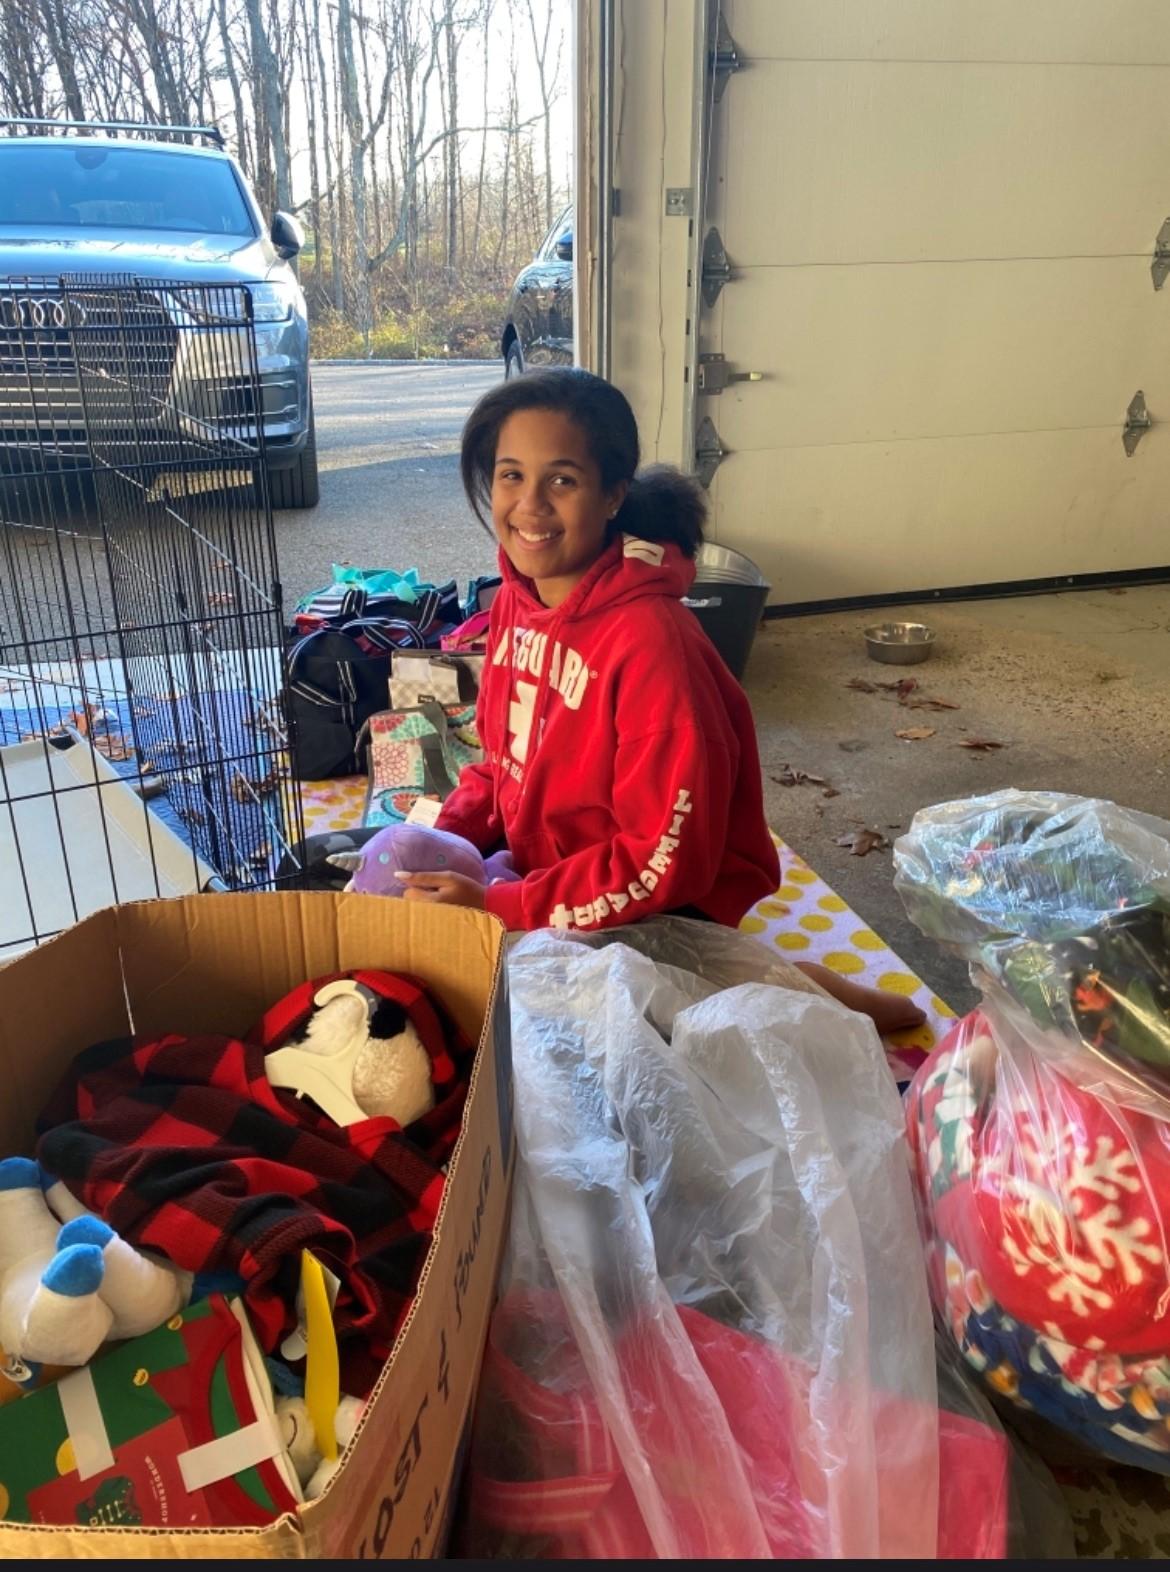 Madison Middle School 2020 Girl in Red Sweatshirt